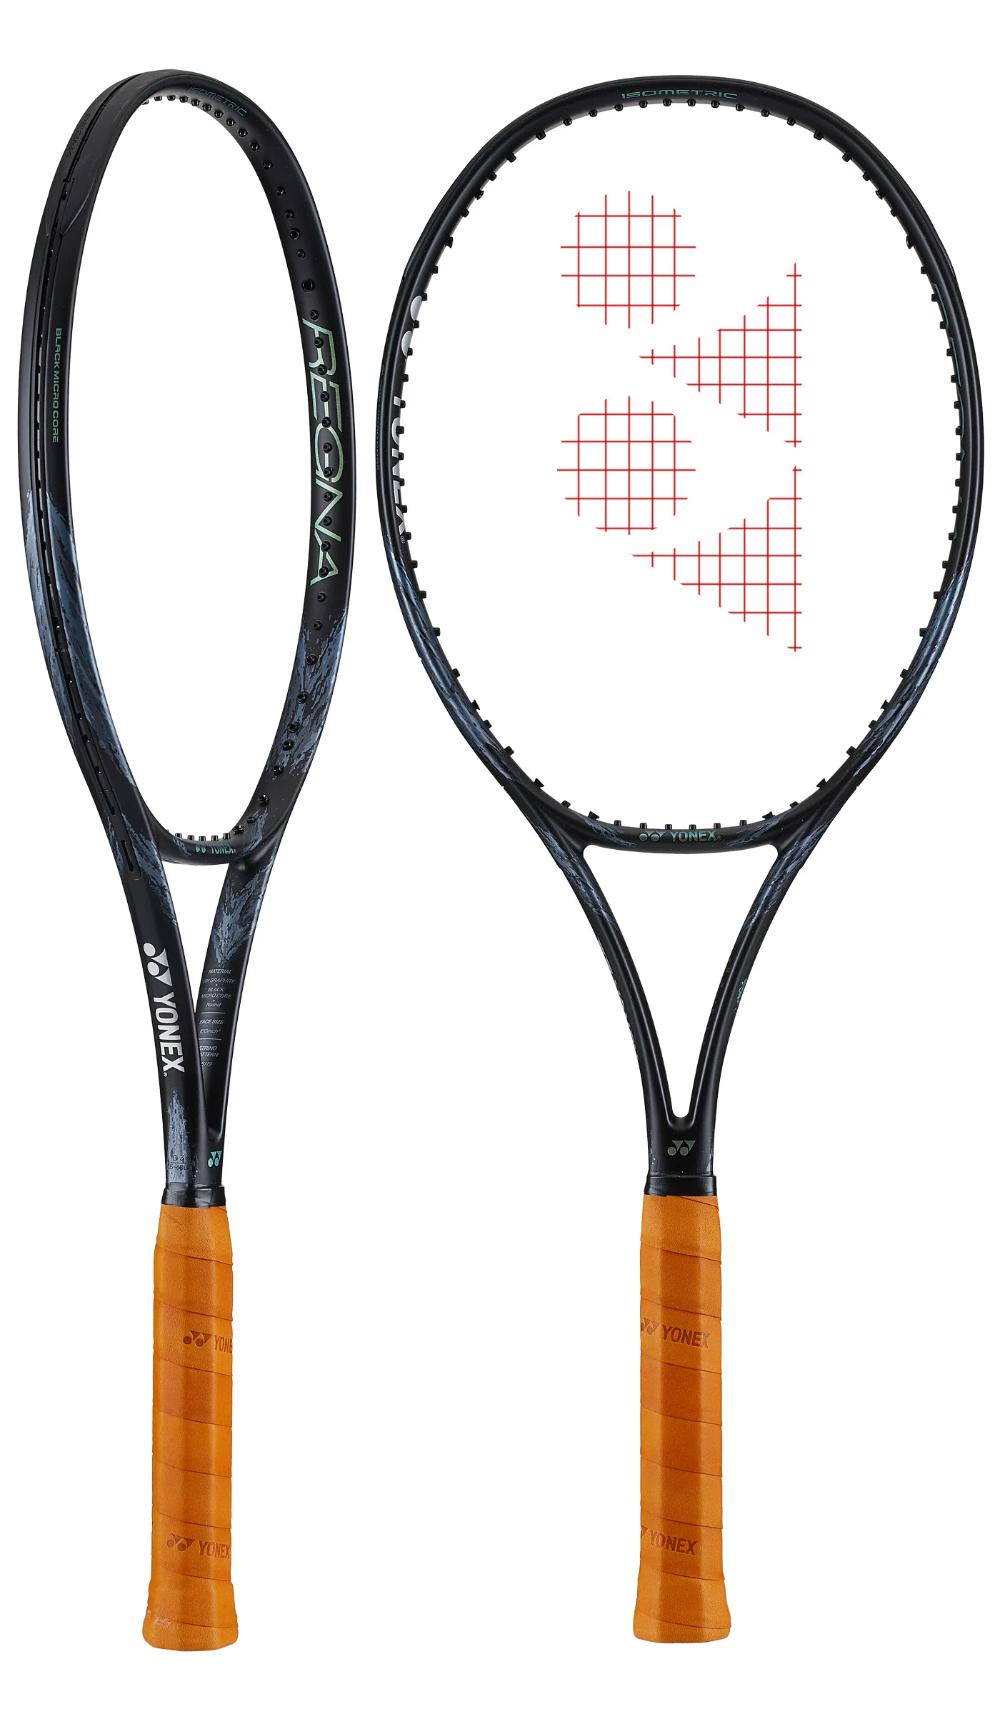 Yonex Regna 100 Racquet Yonex Tennis Equipment Racquet